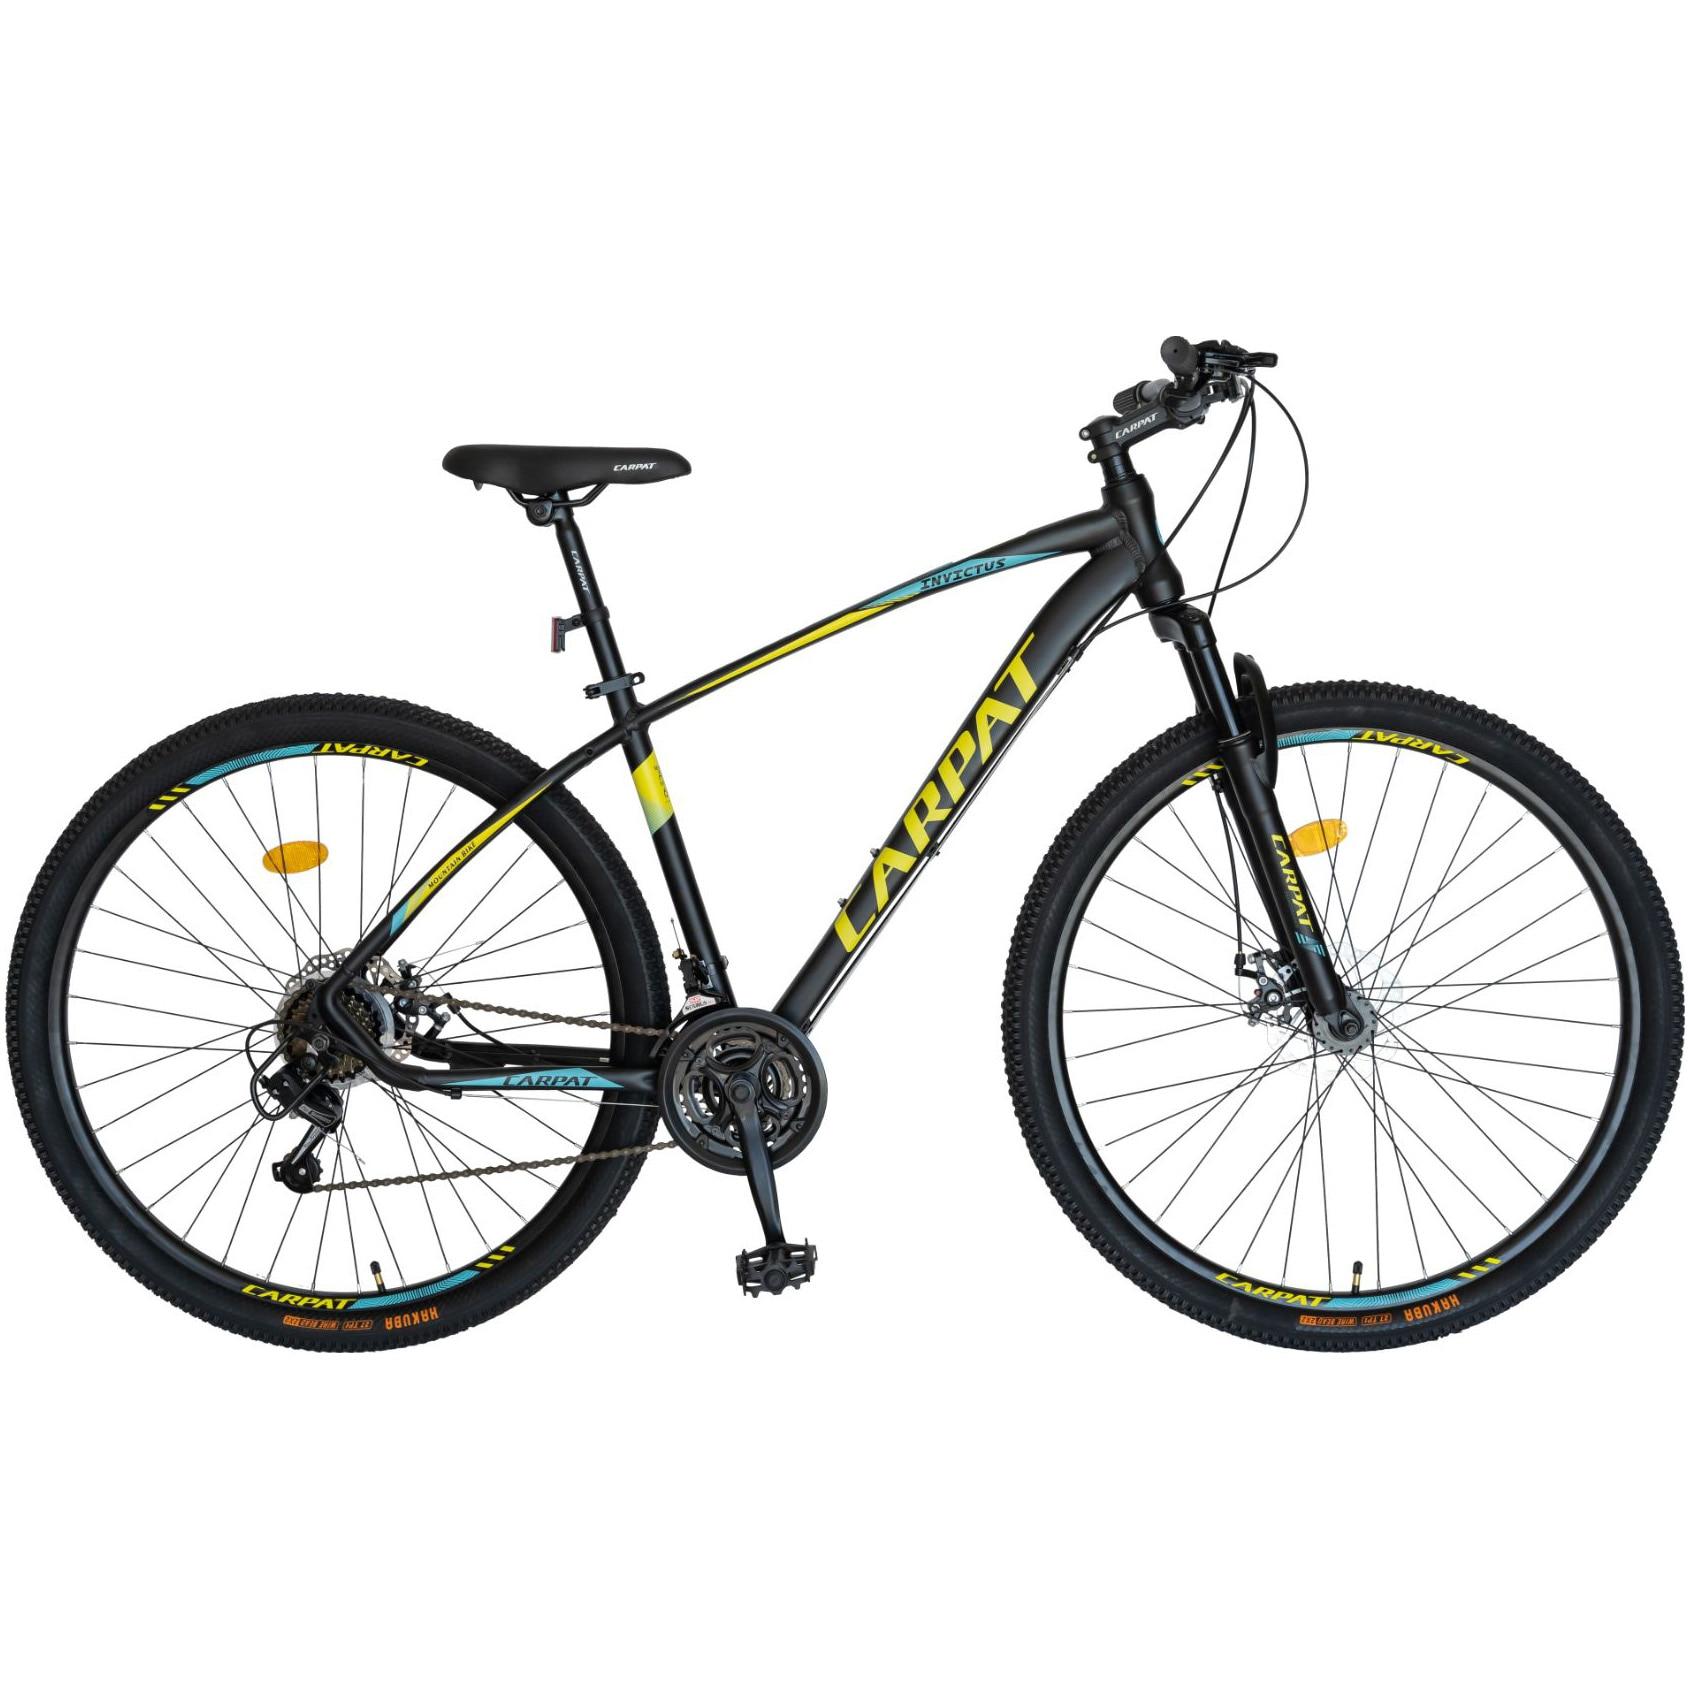 Fotografie Bicicleta Carpat MTB-HT 29-er C2957C Negru/GAlben